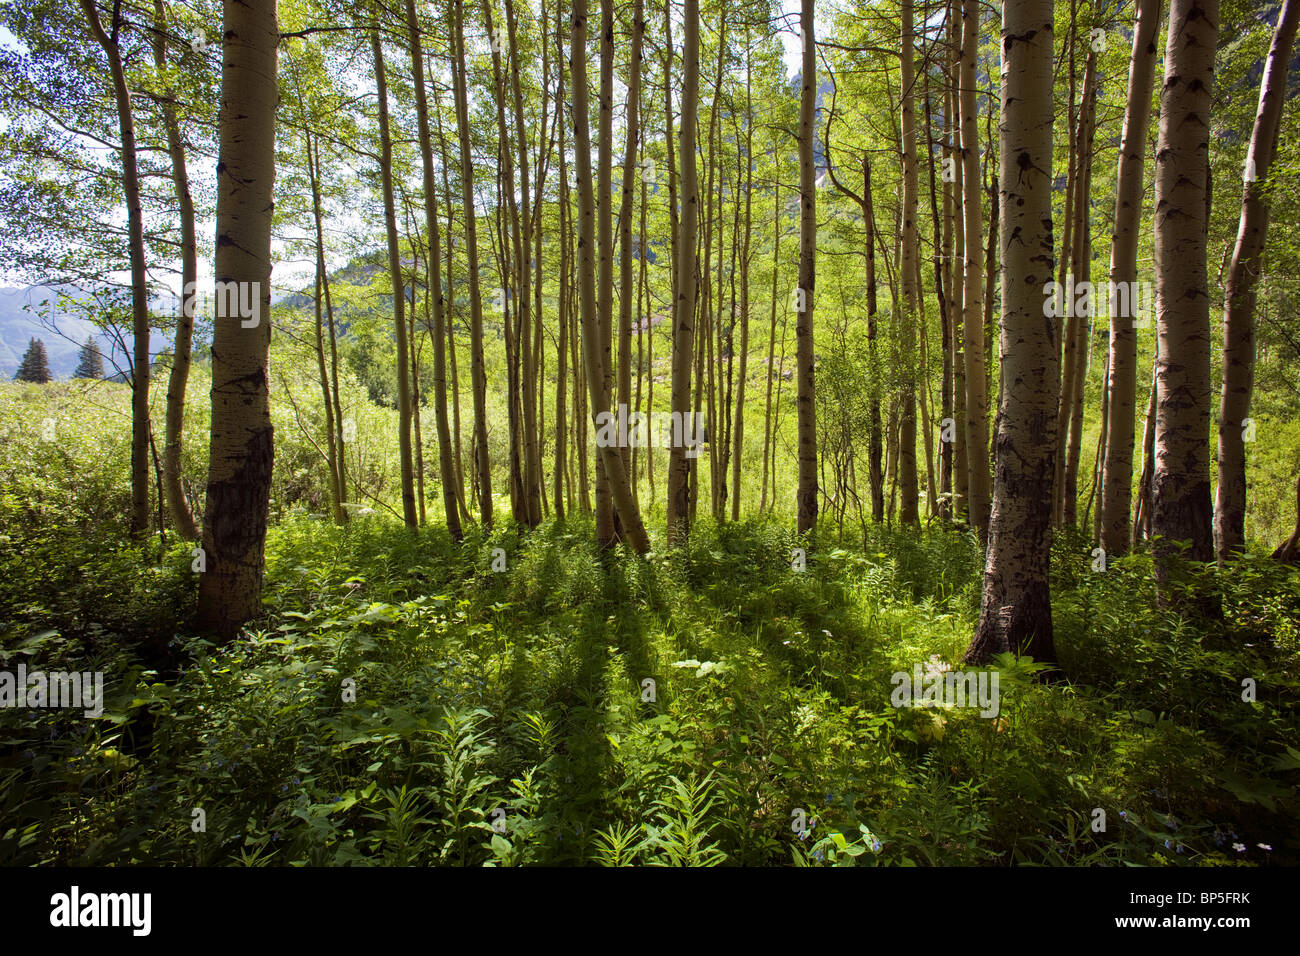 Hinterleuchtete Aspen Bäume und Wald Bodendecker, Maroon Bells Snowmass Wilderness Area, White River National Stockbild